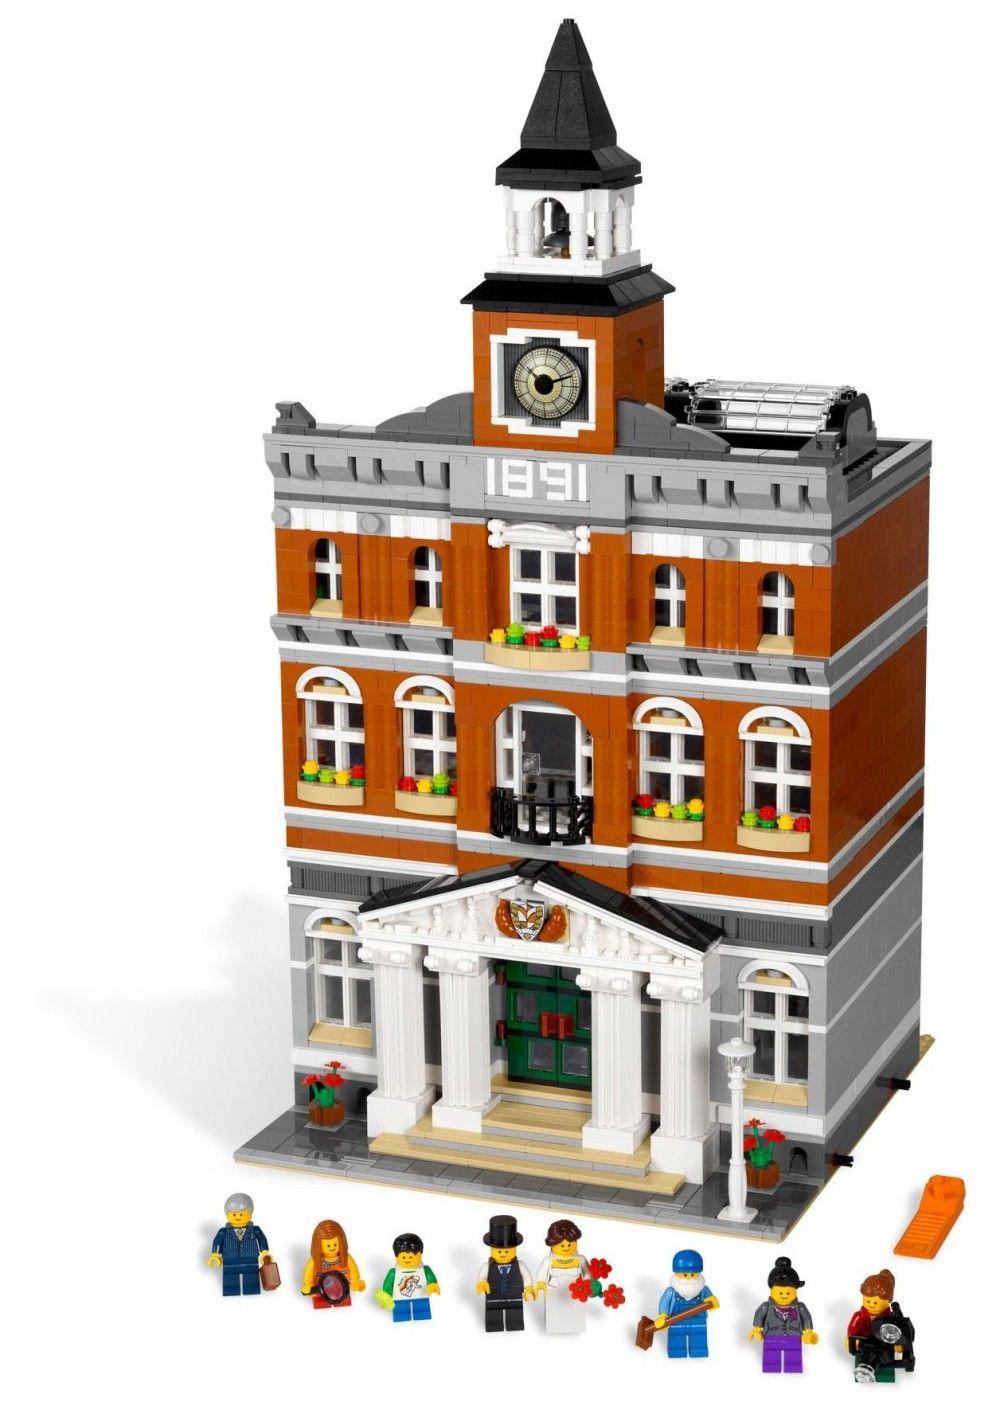 MairieModulaire Lego 10224 Creator Pas CherLa WYb9IeDEH2